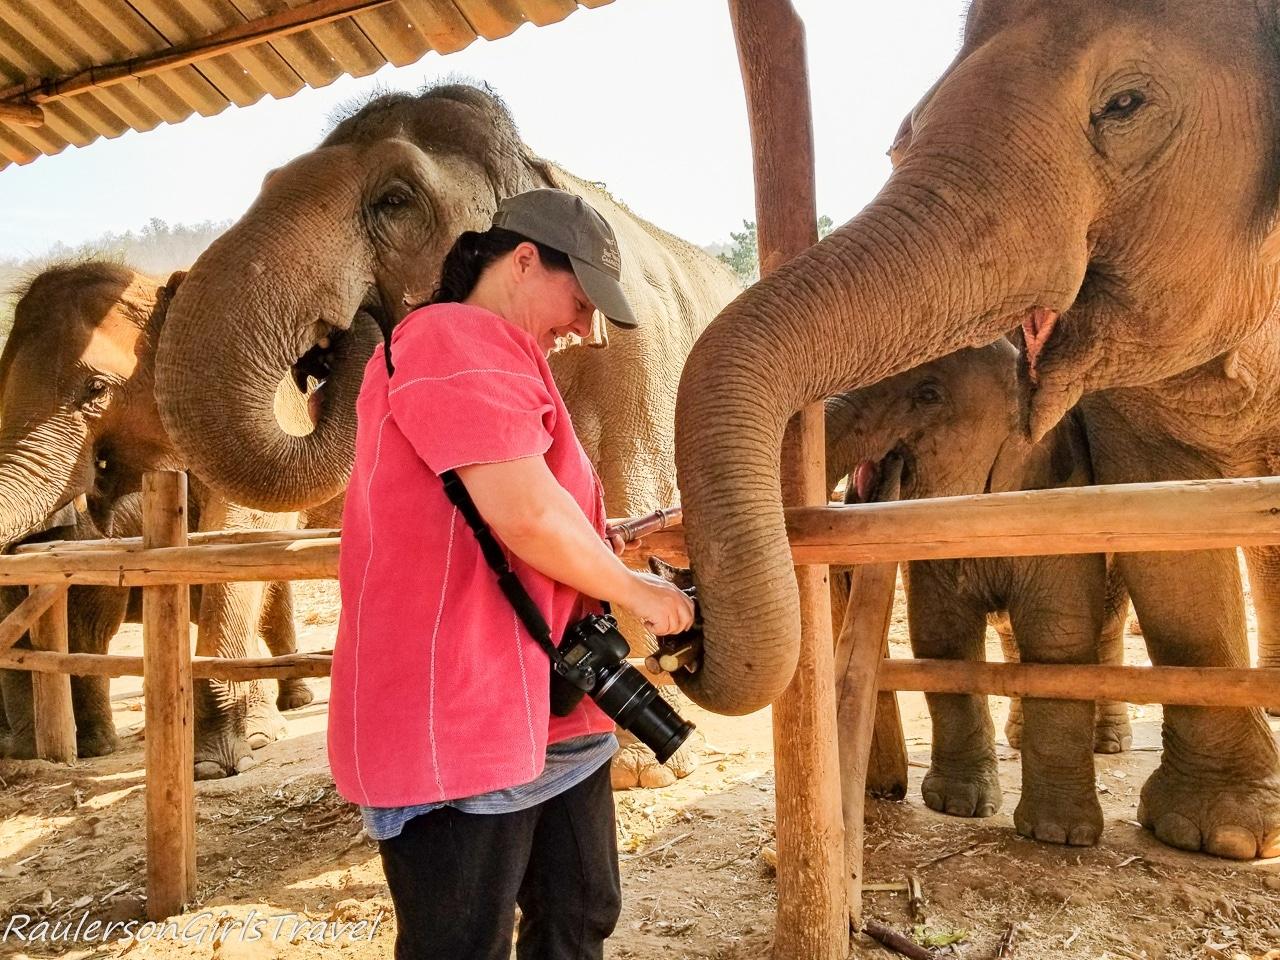 Heather feeding the elephants bamboo